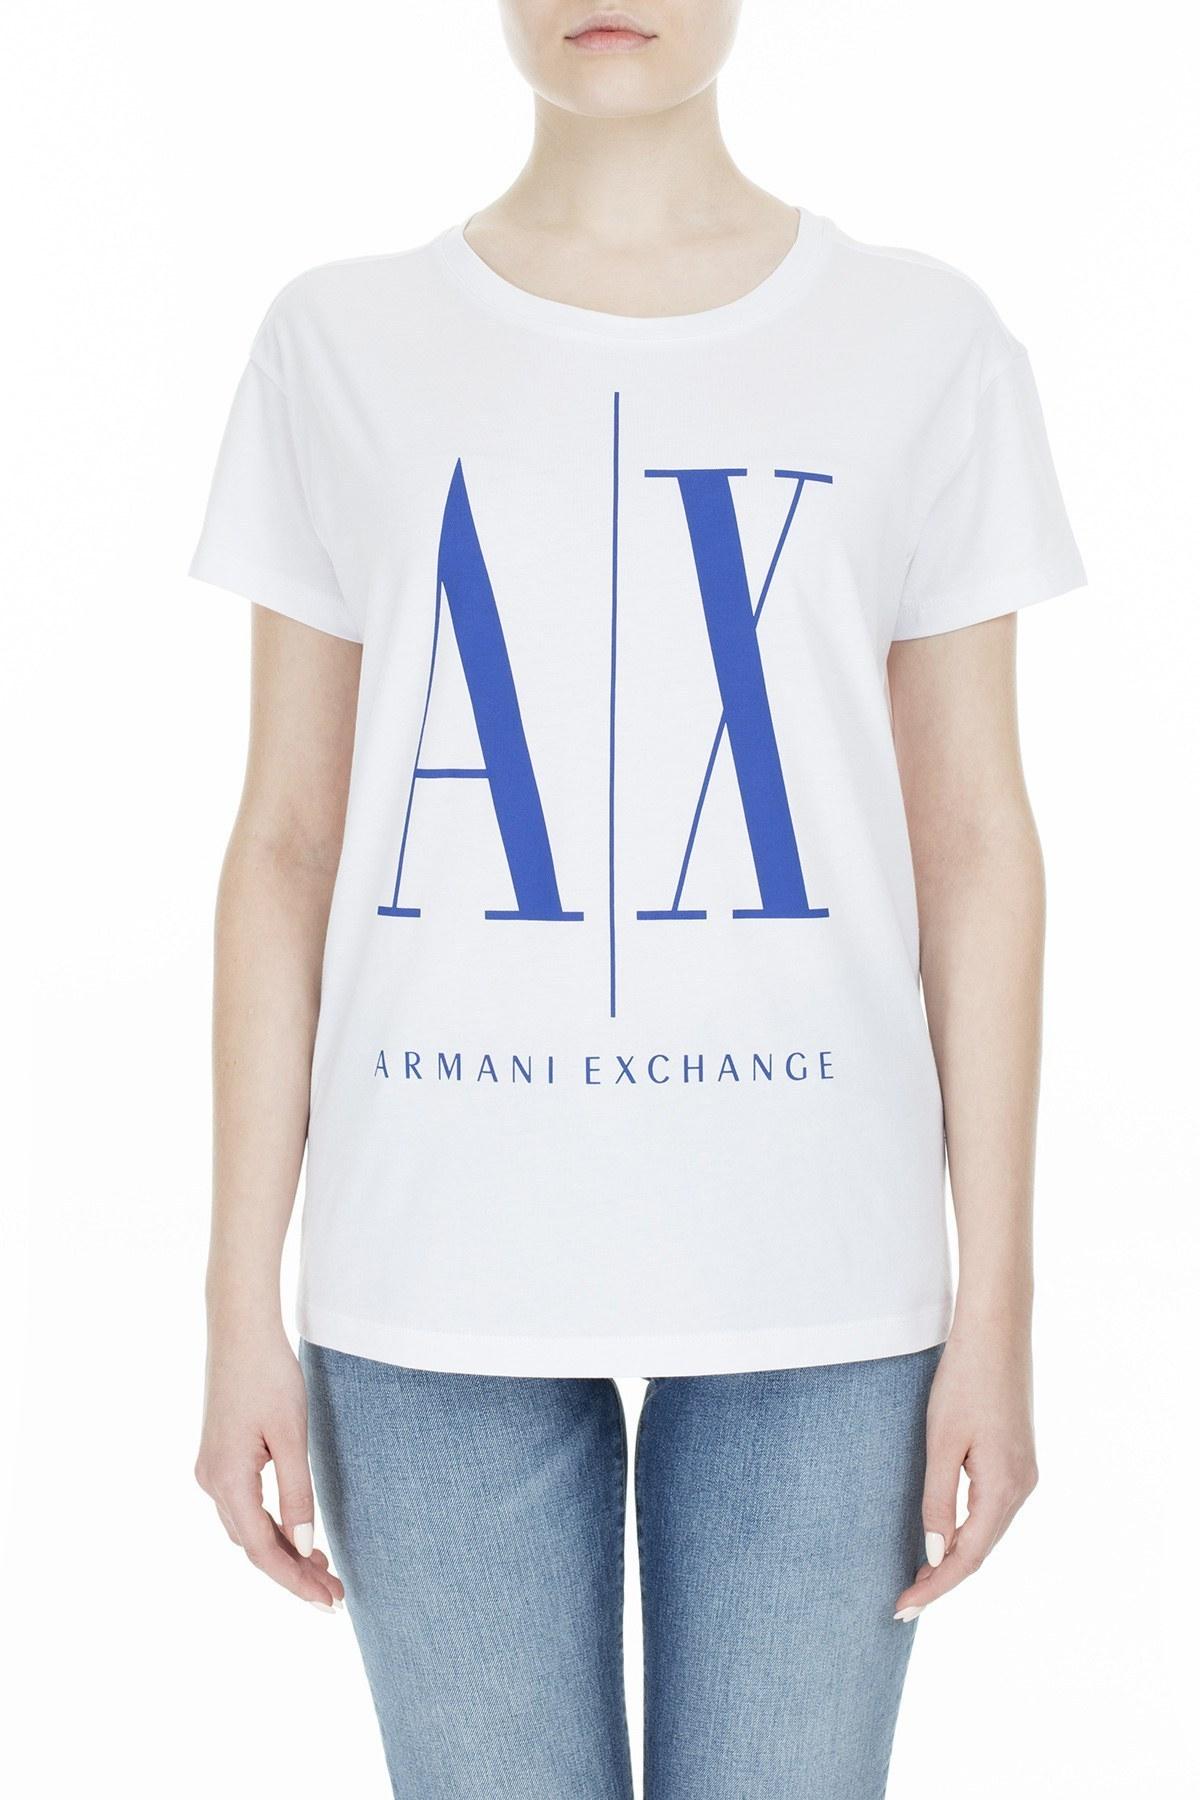 Armani Exchange Kadın T Shirt 8NYTCX YJG3Z 7141 BEYAZ